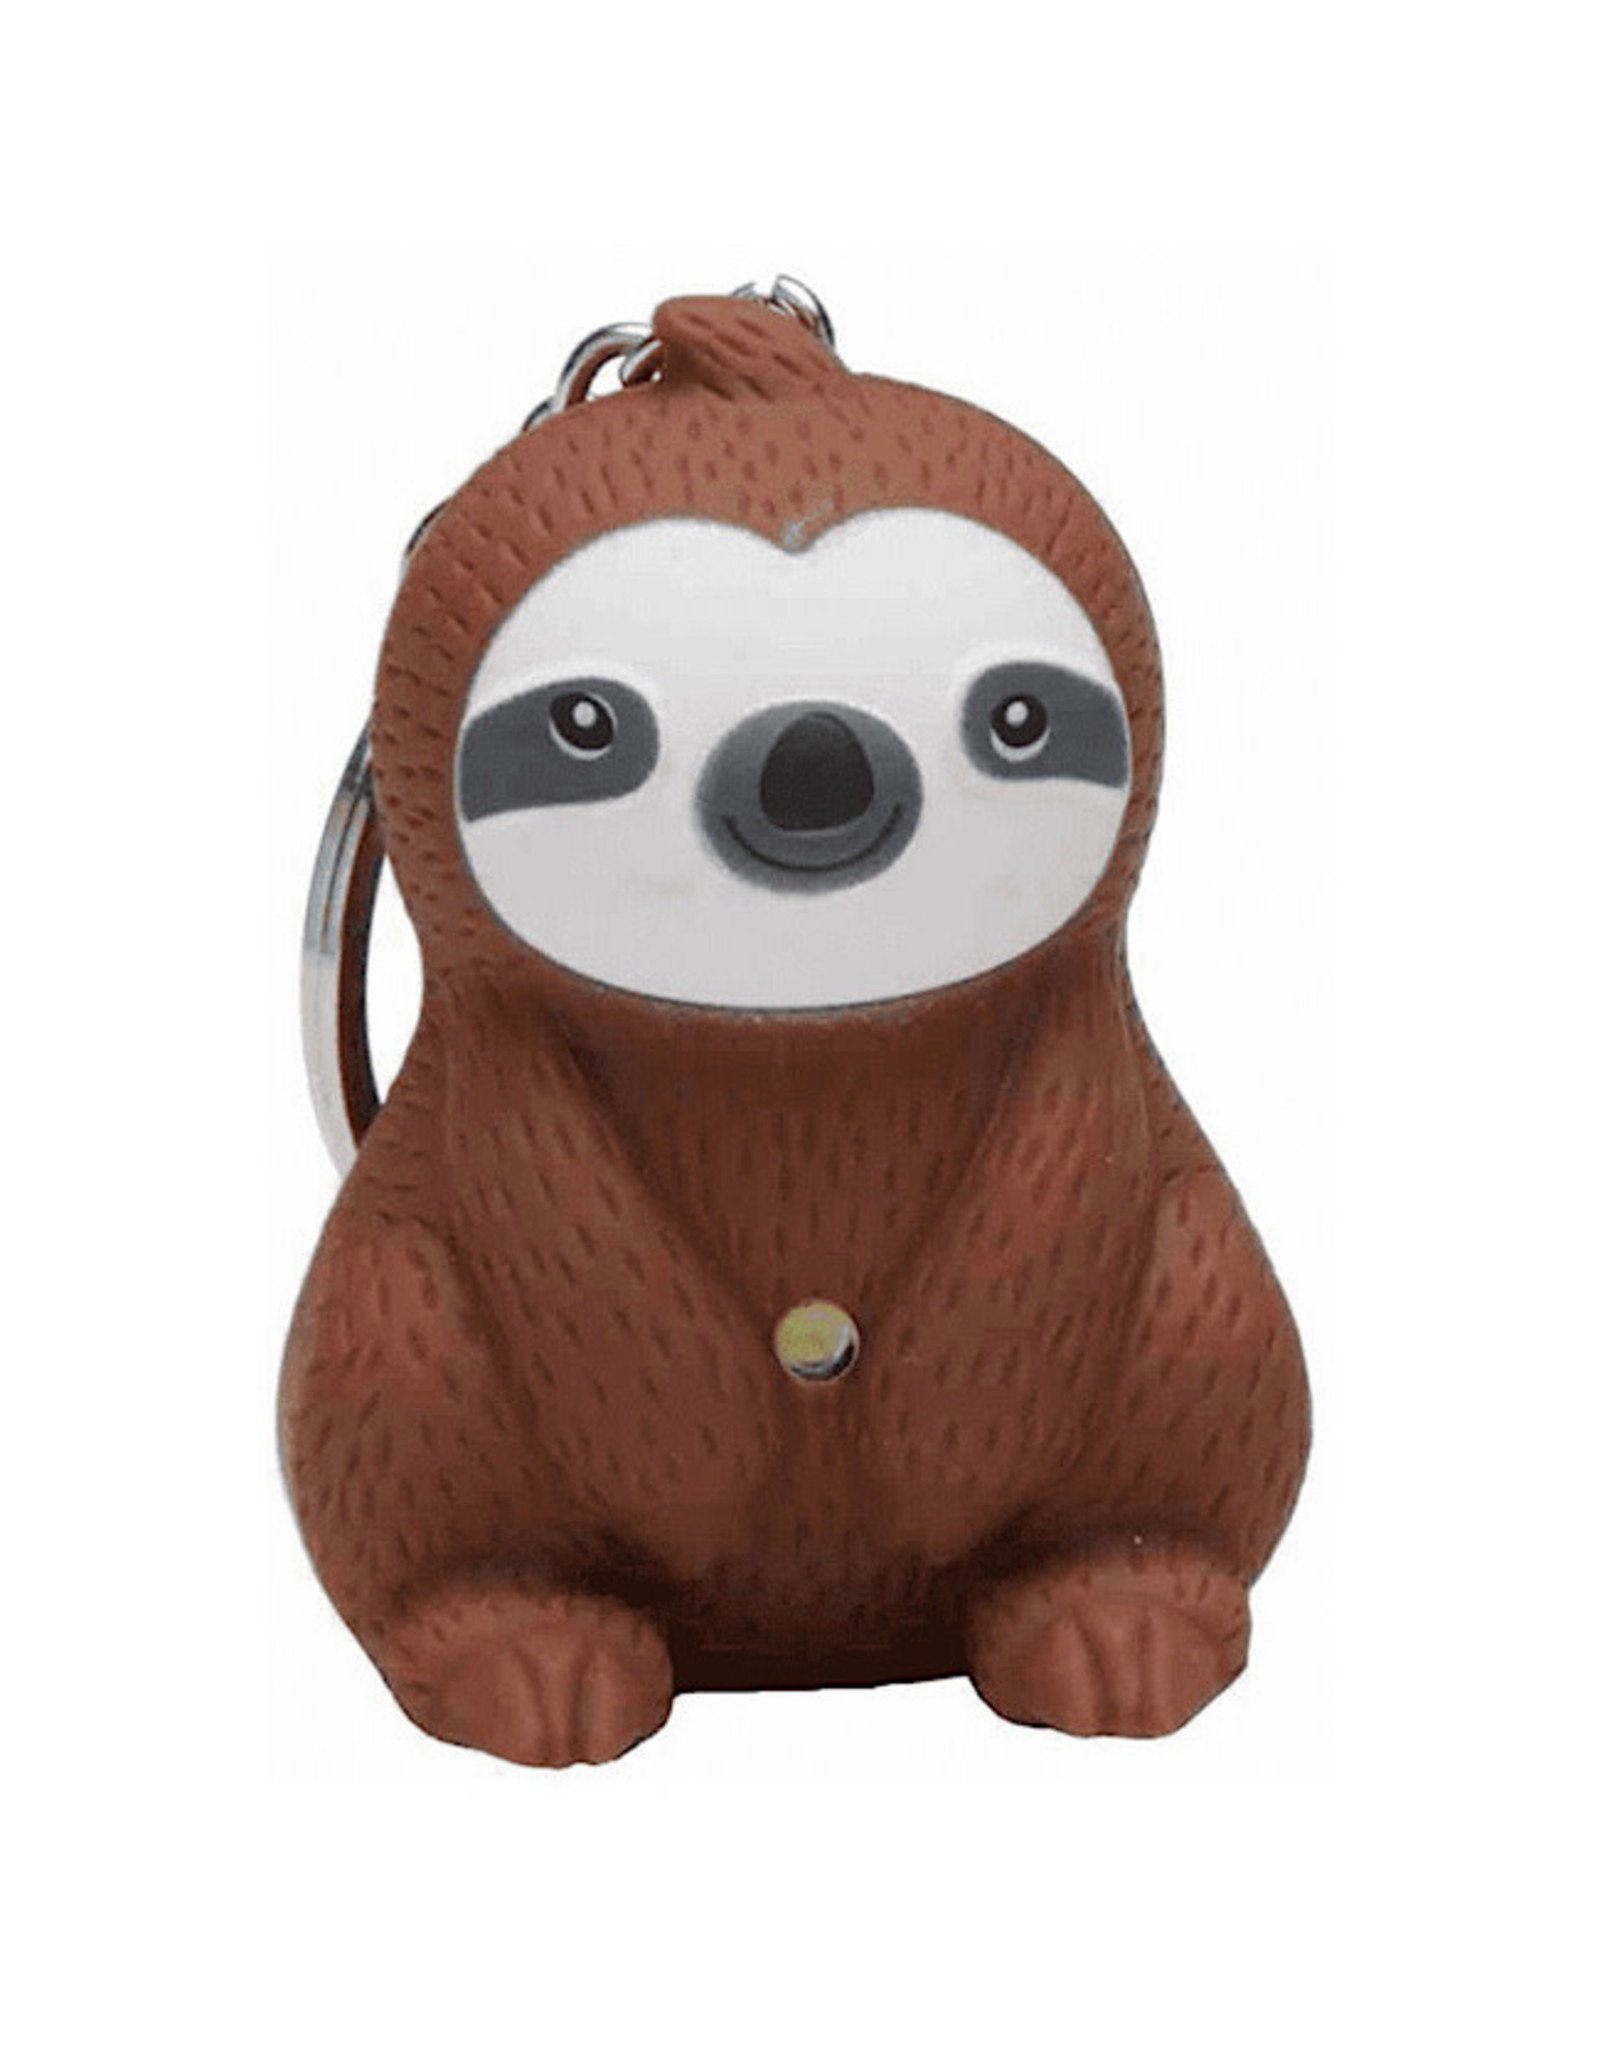 KeyChain (LED) - Sloth (Brown)